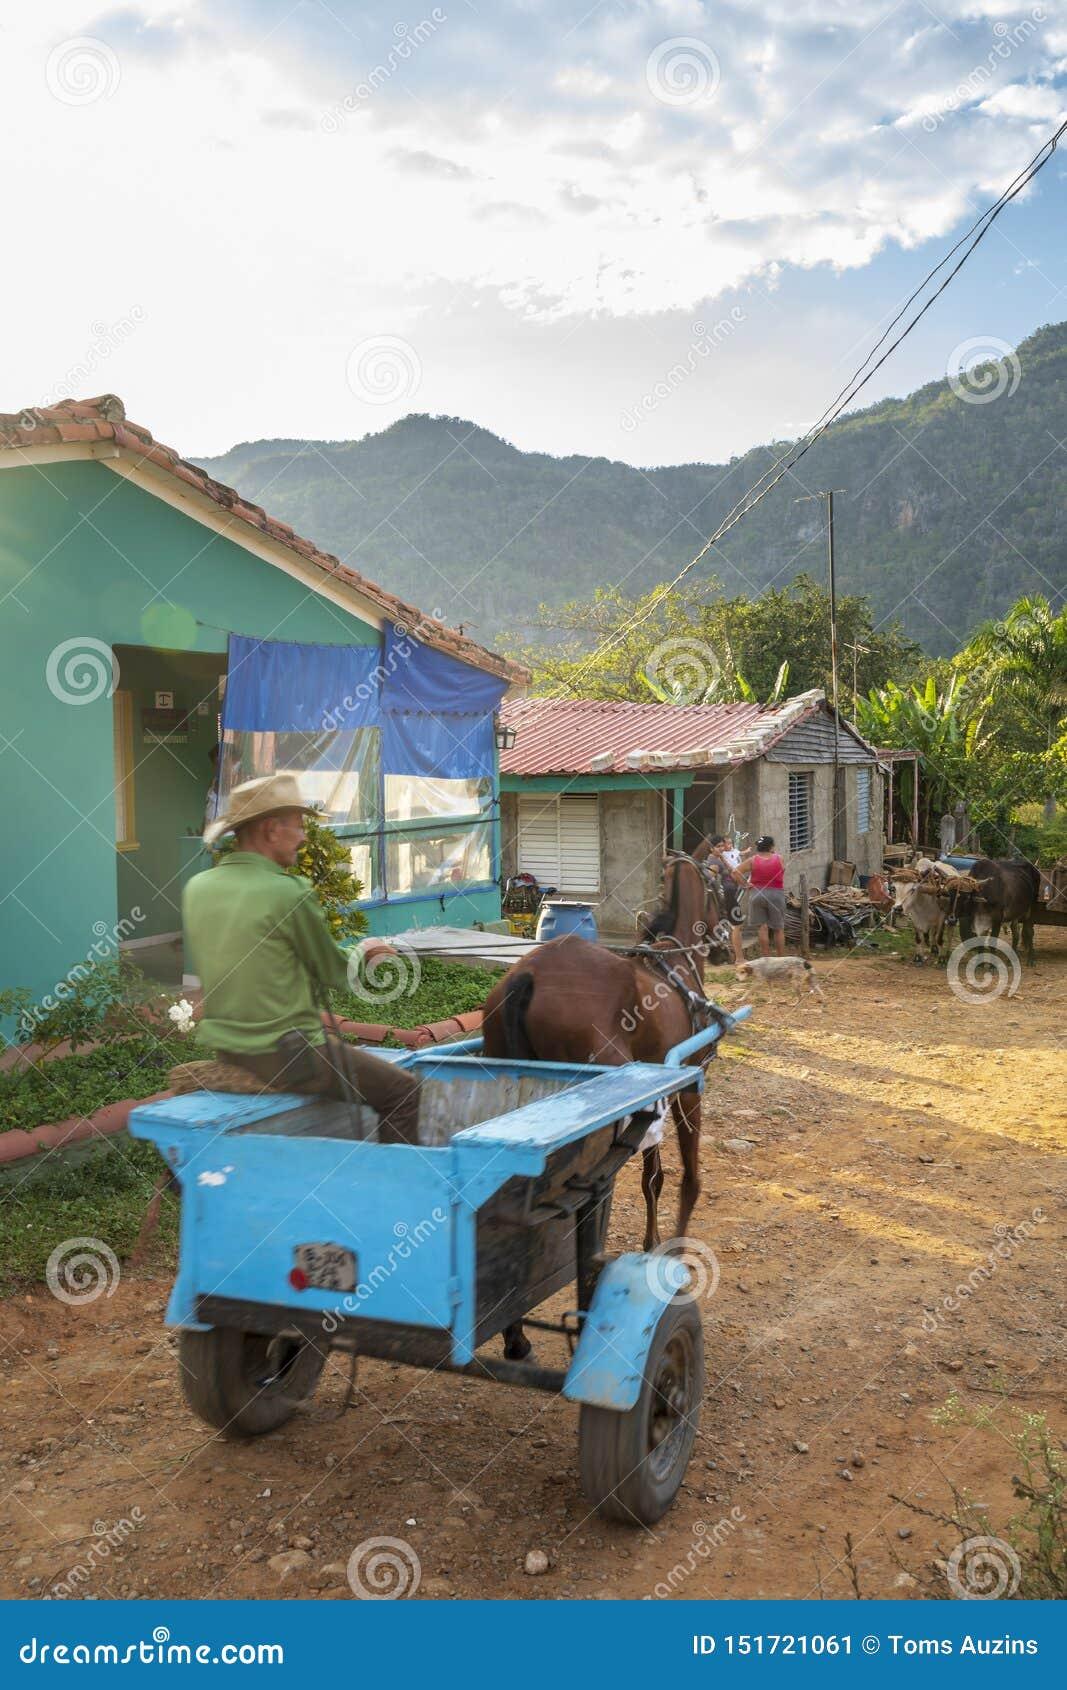 Farmer using horse chariot, UNESCO, Vinales, Pinar del Rio Province, Cuba, West Indies, Caribbean, Central America